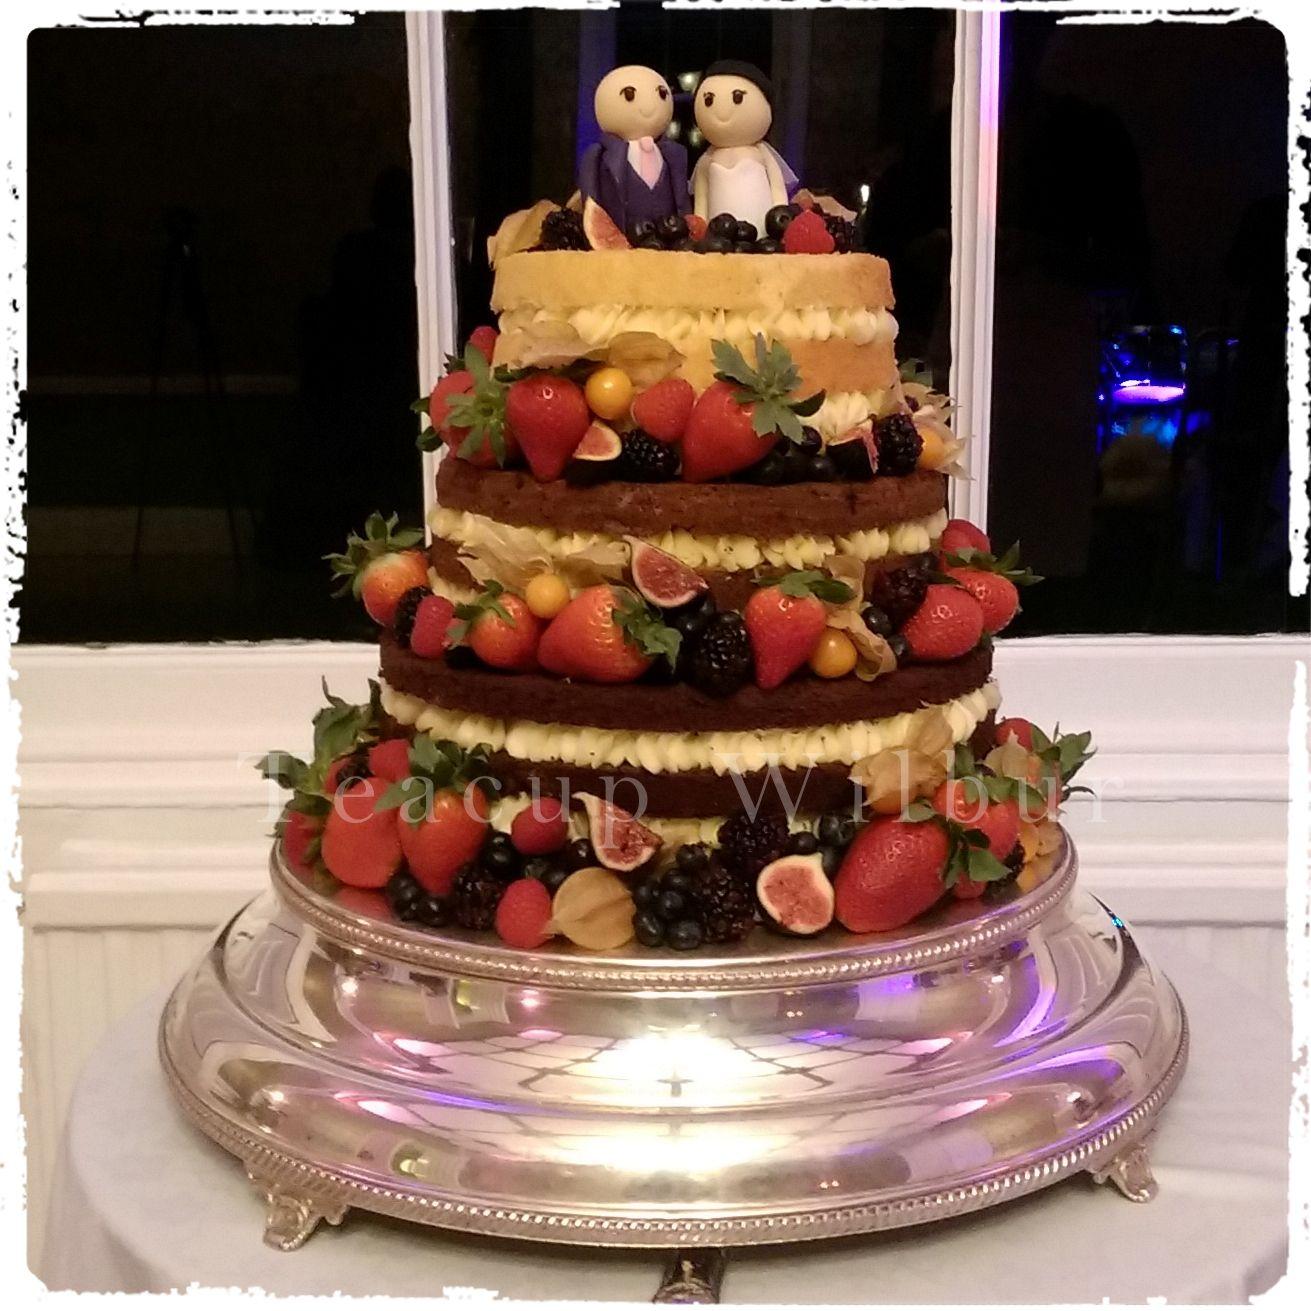 Three Tiers Naked Wedding Cake With Fresh Fruits Top Tier Lemon Sponge Cake With